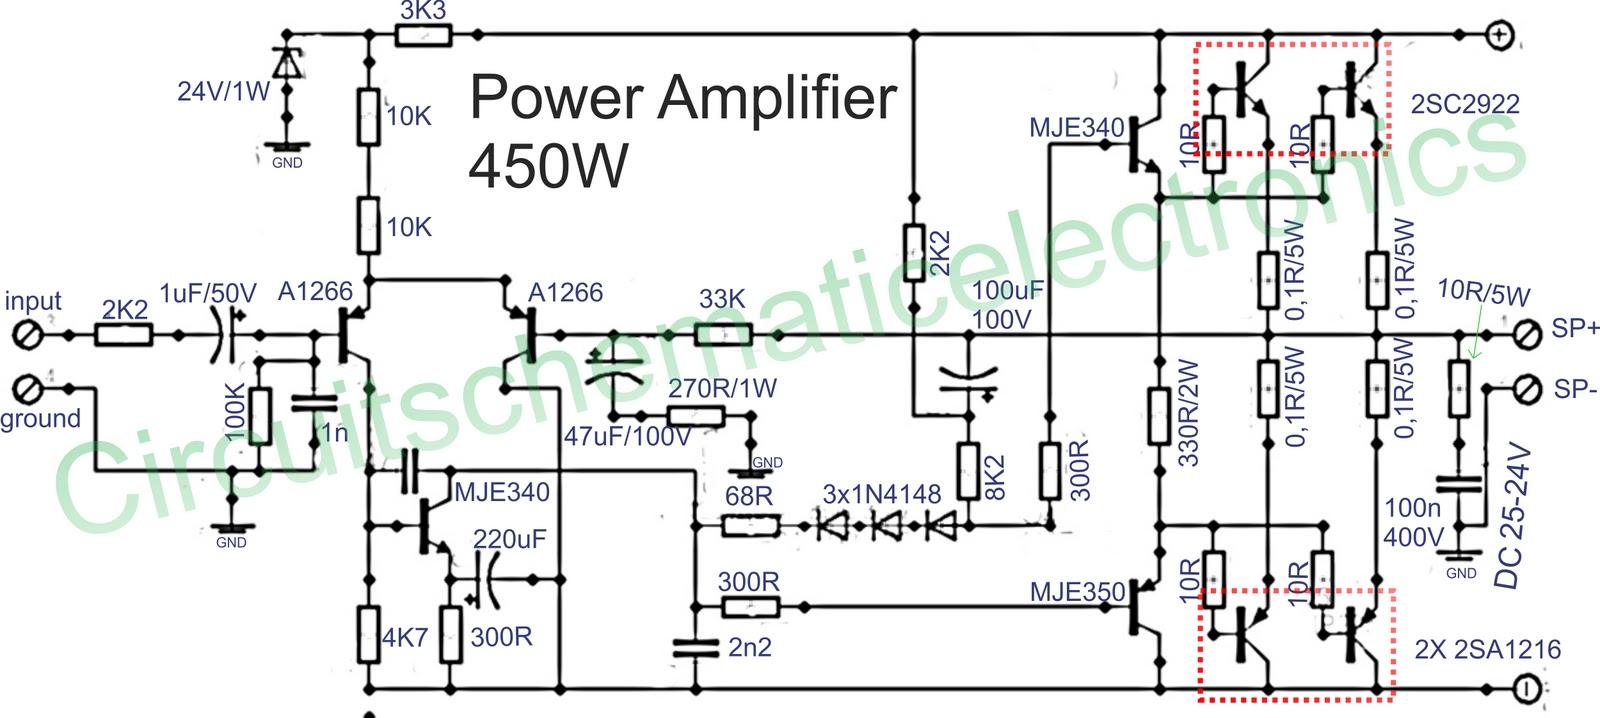 1000 2 Power Zone Amp Wiring Diagram Lighting Wire Crunch Kenwood Installation Related Keywords Suggestions Schematic Online